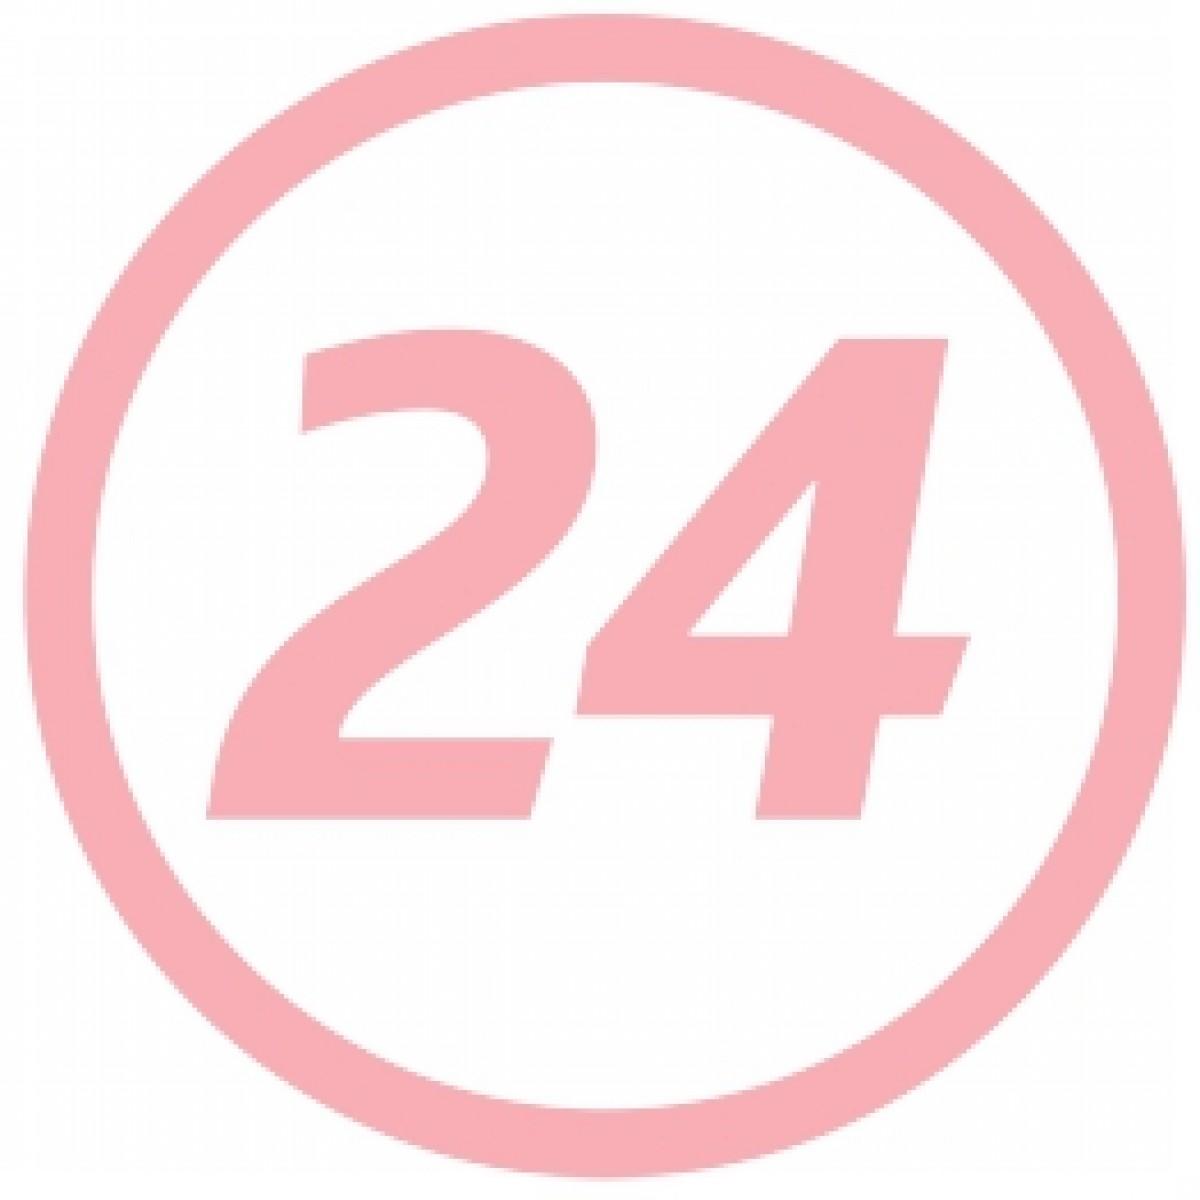 BIODERMA ABCDerm BabySquam, Crema, 40ml